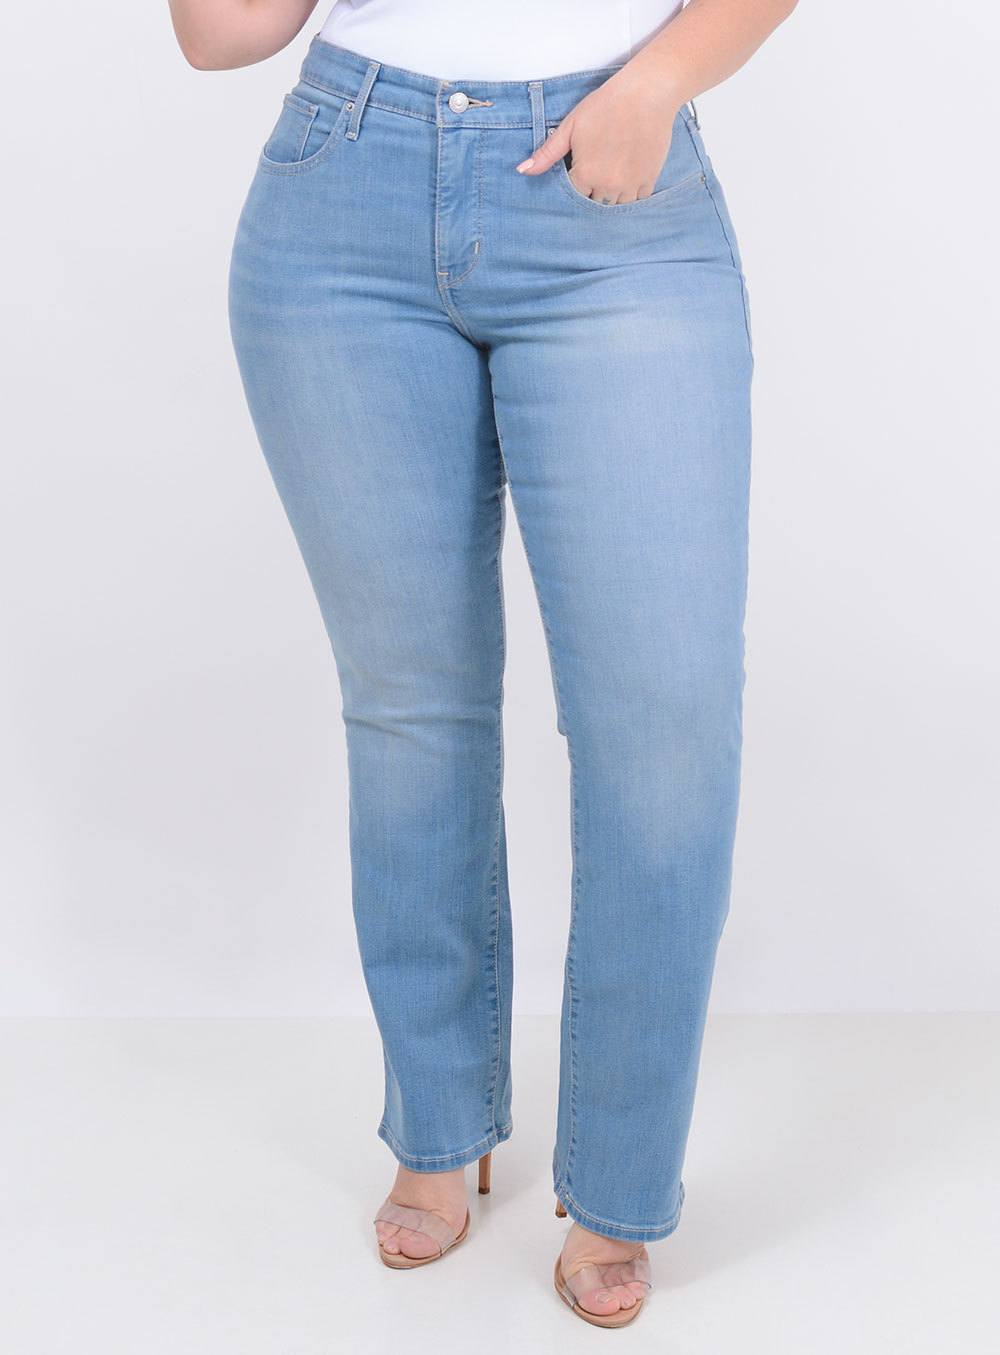 Calça Levi's Jeans Feminina 314 Straight ref. LV196410004